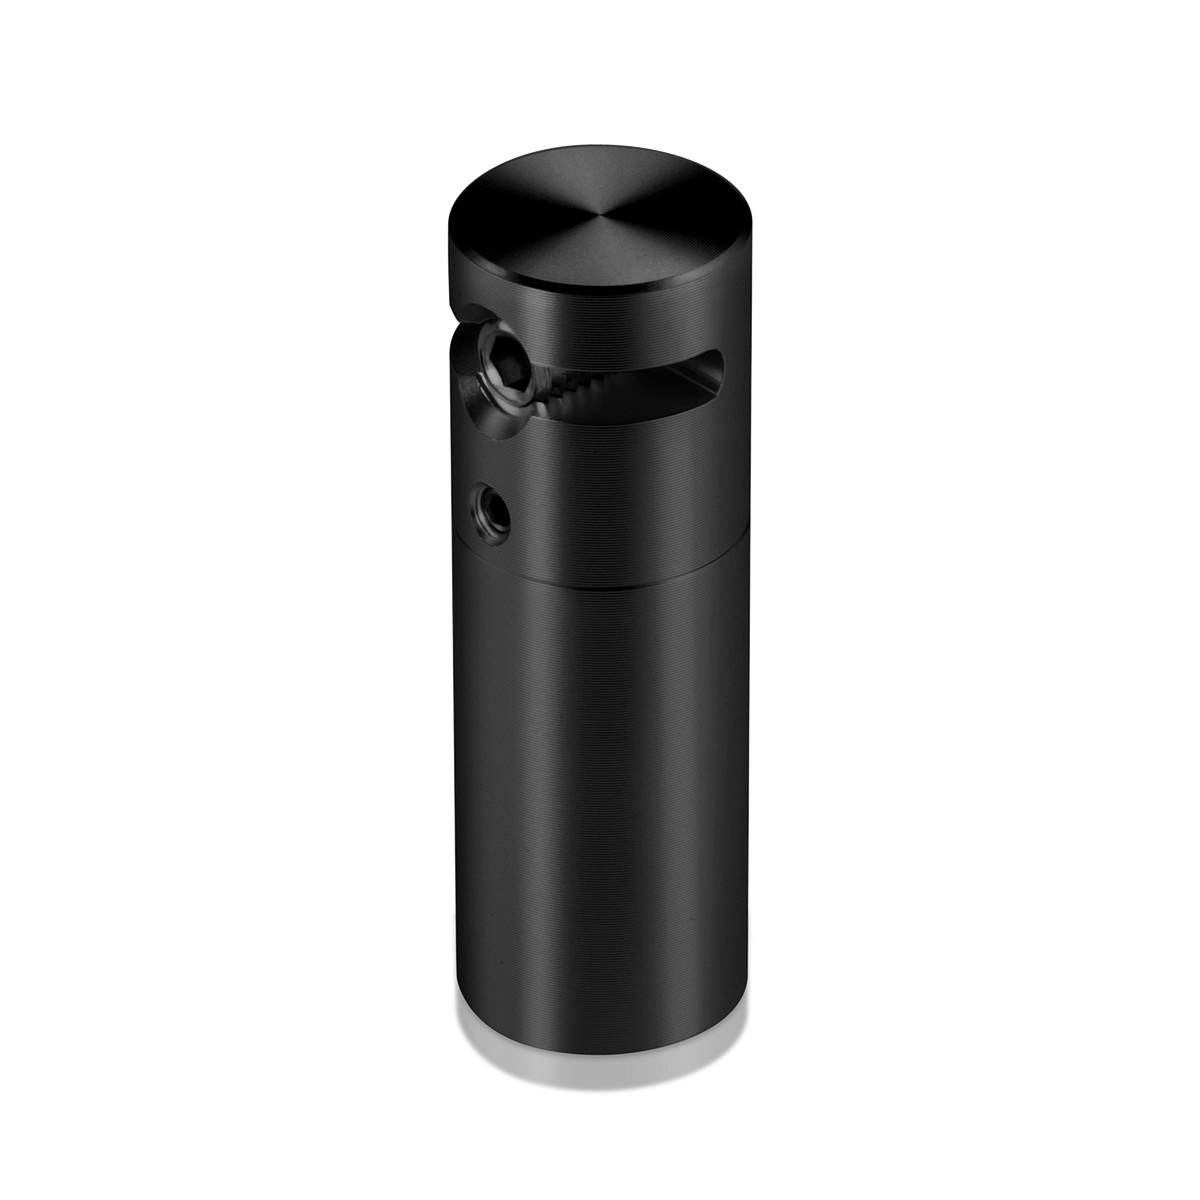 2'' Length x 5/8'' Diameter Aluminum Black Anodized Side Gripping Support for 1/4'' Diameter Rod